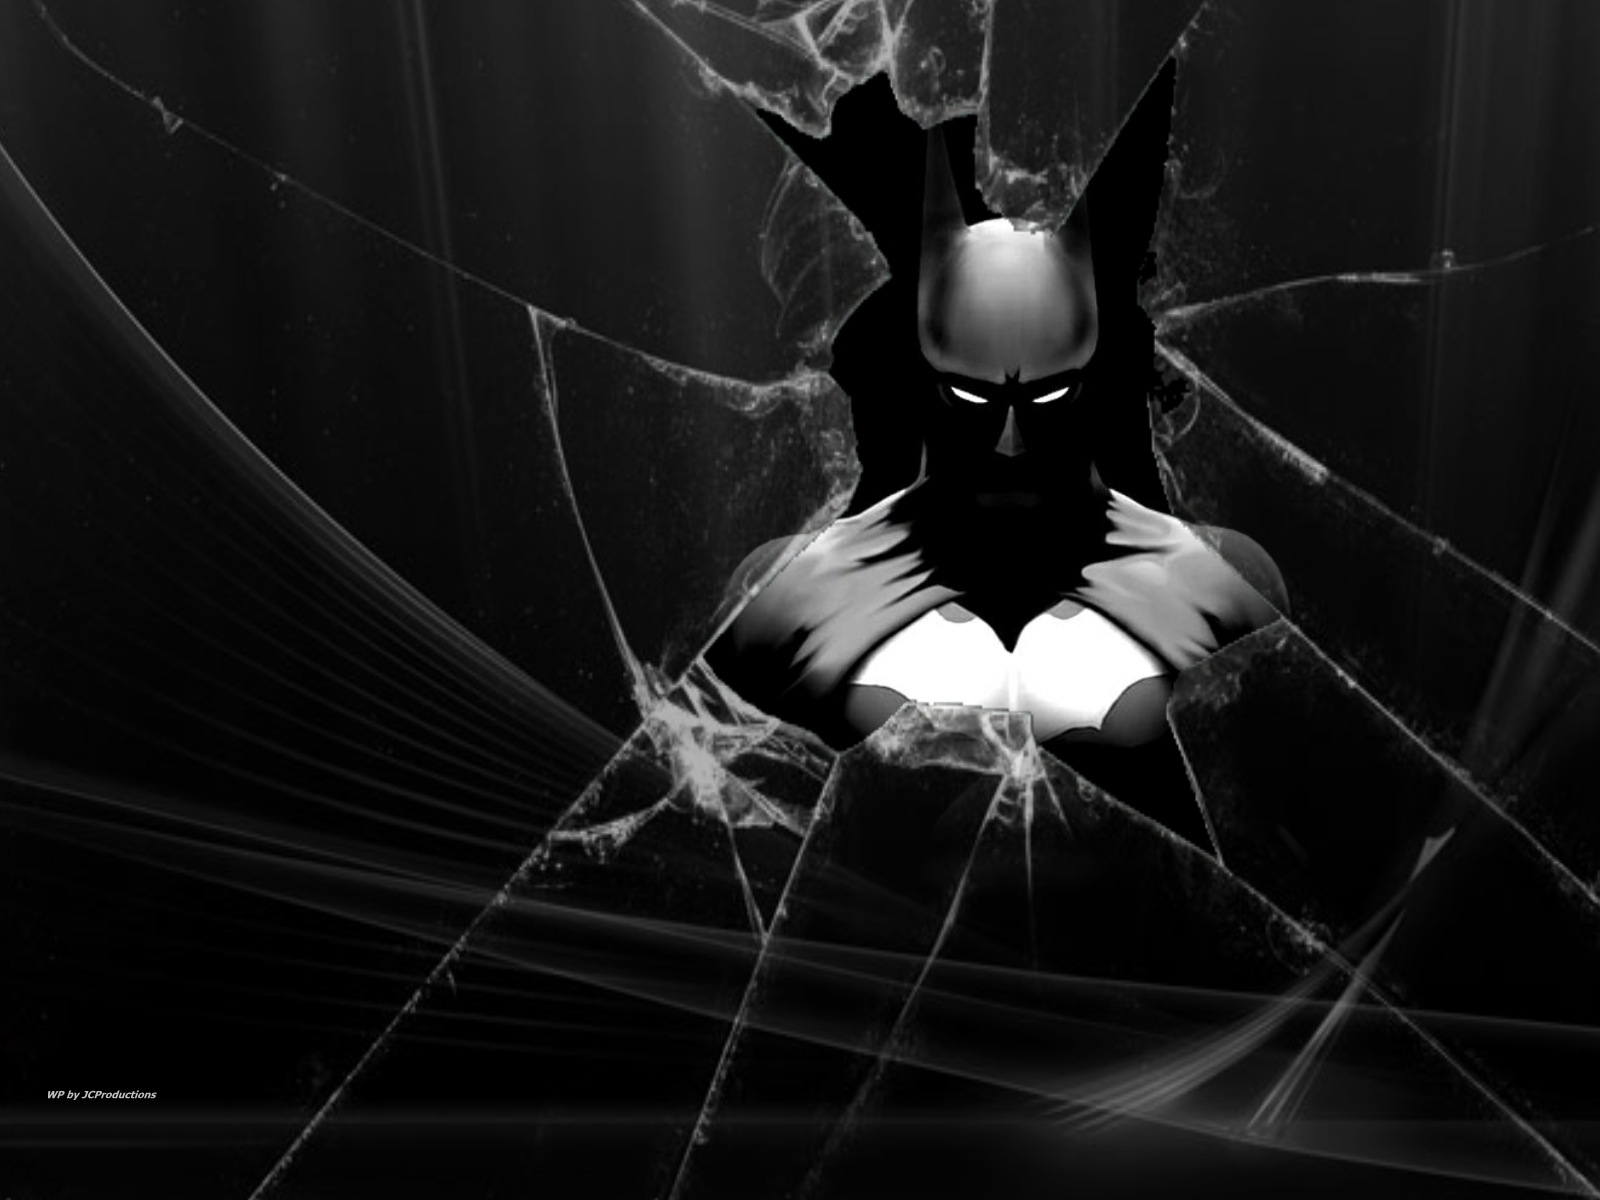 batman images batman hd wallpaper and background photos 27163409